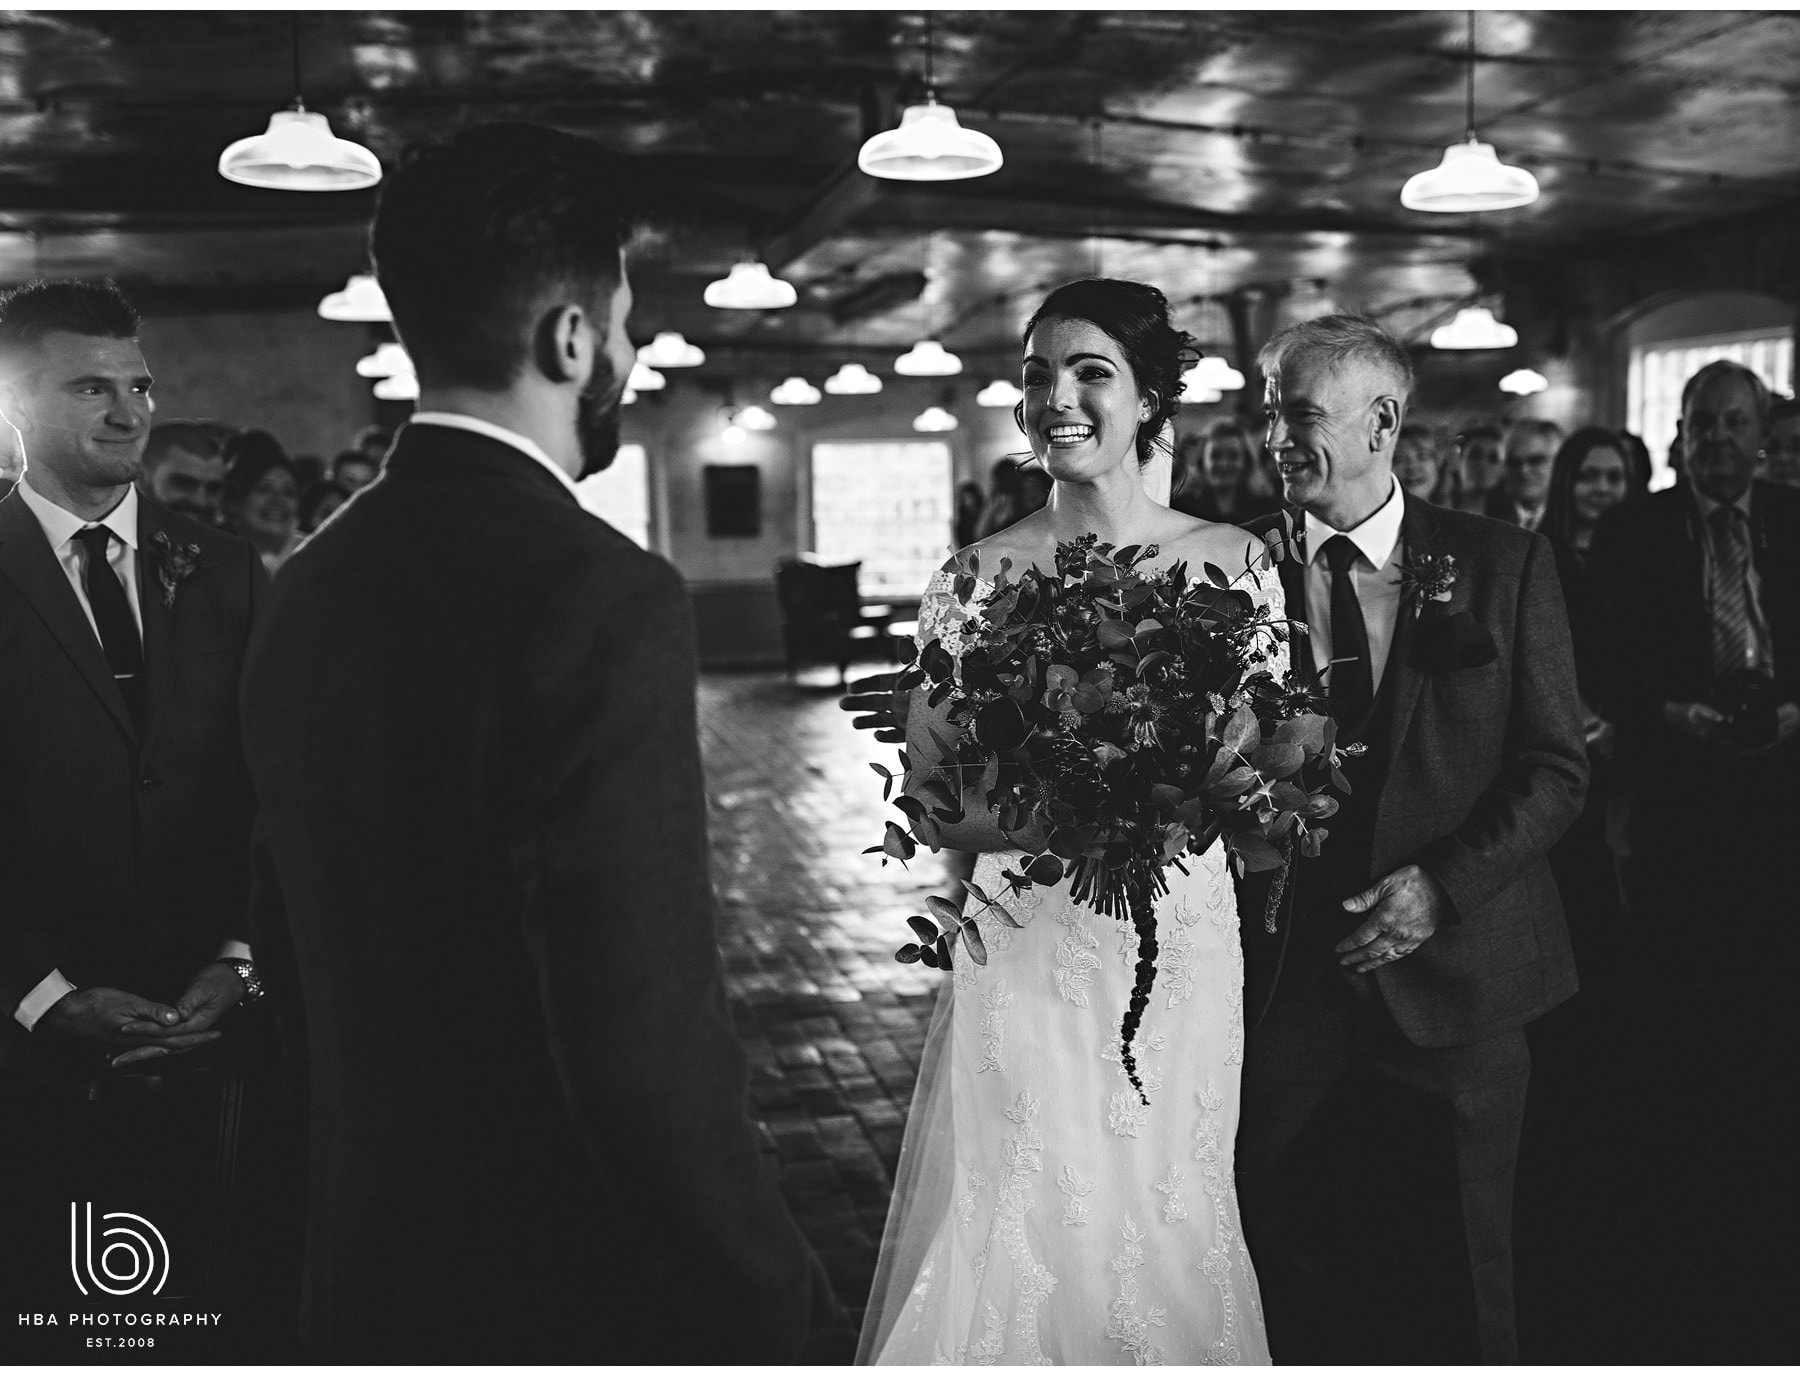 the bride seeing the groom